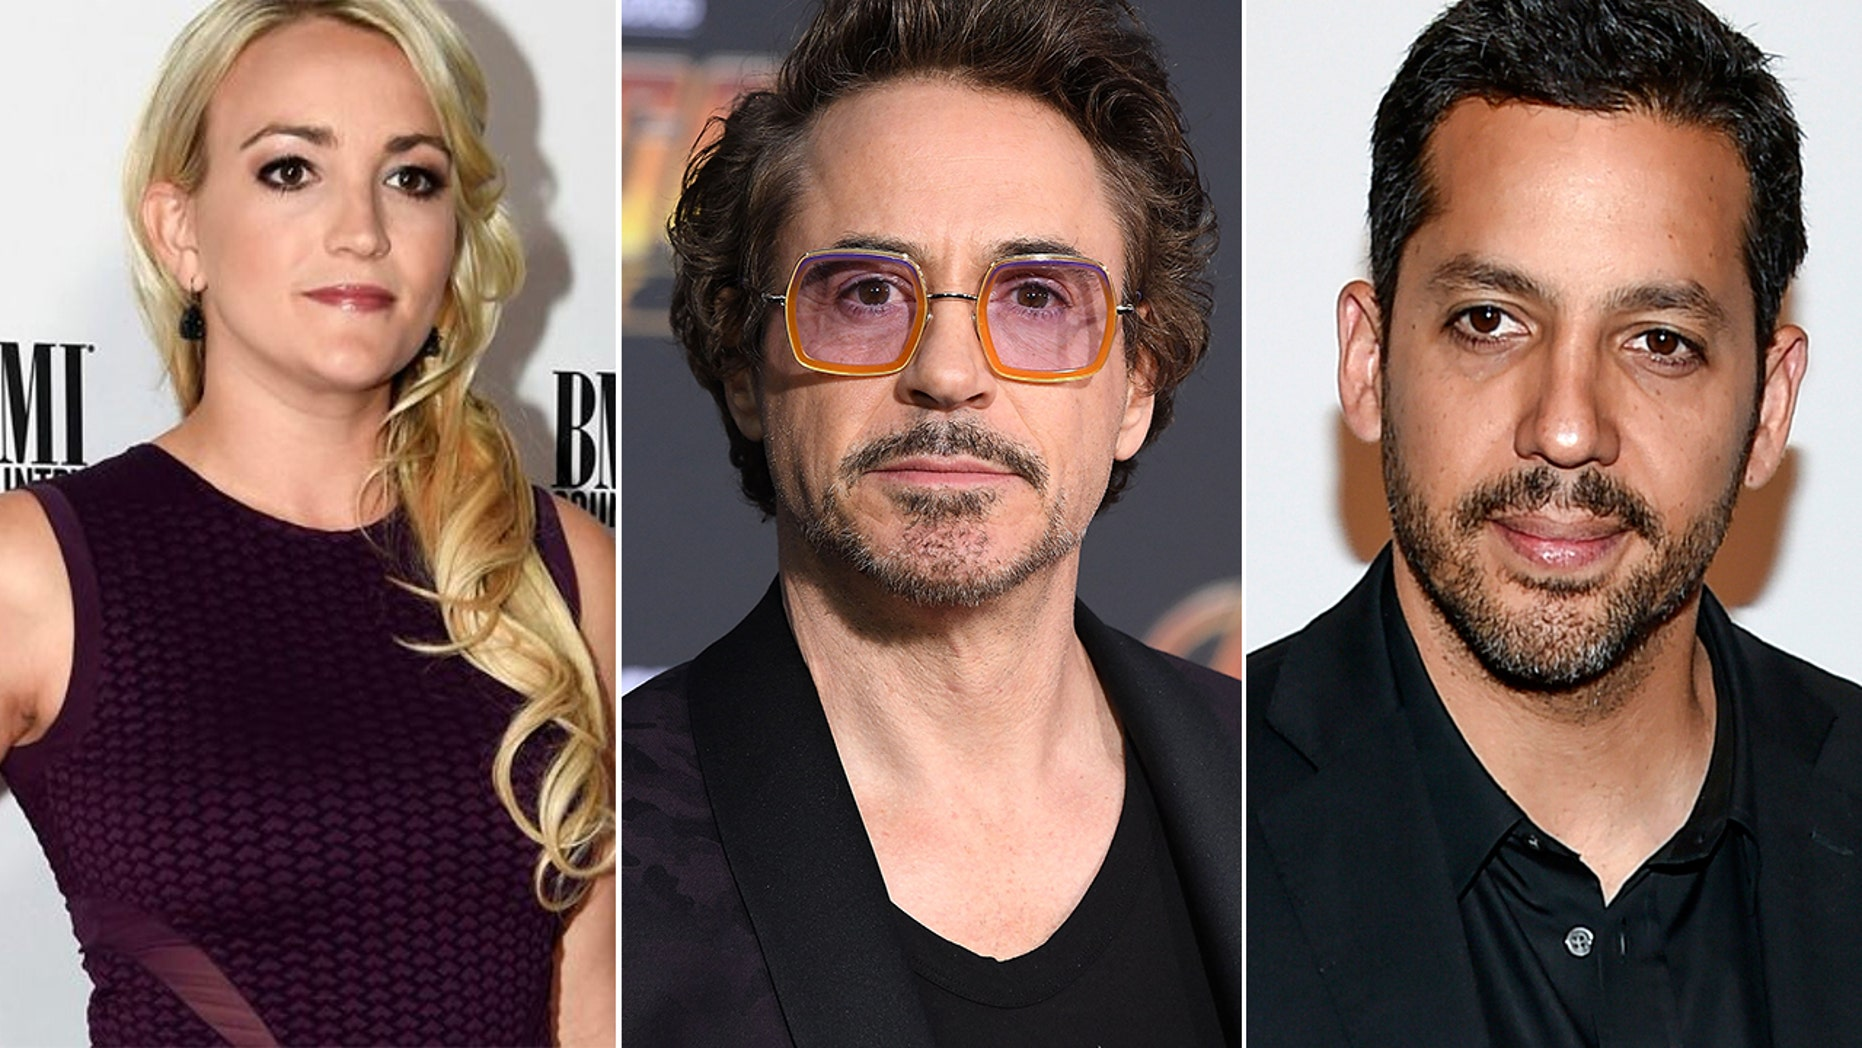 From l-r: Jamie Lynn Spears, Robert Downey Jr. and David Blaine all celebrate their birthday on April 4.